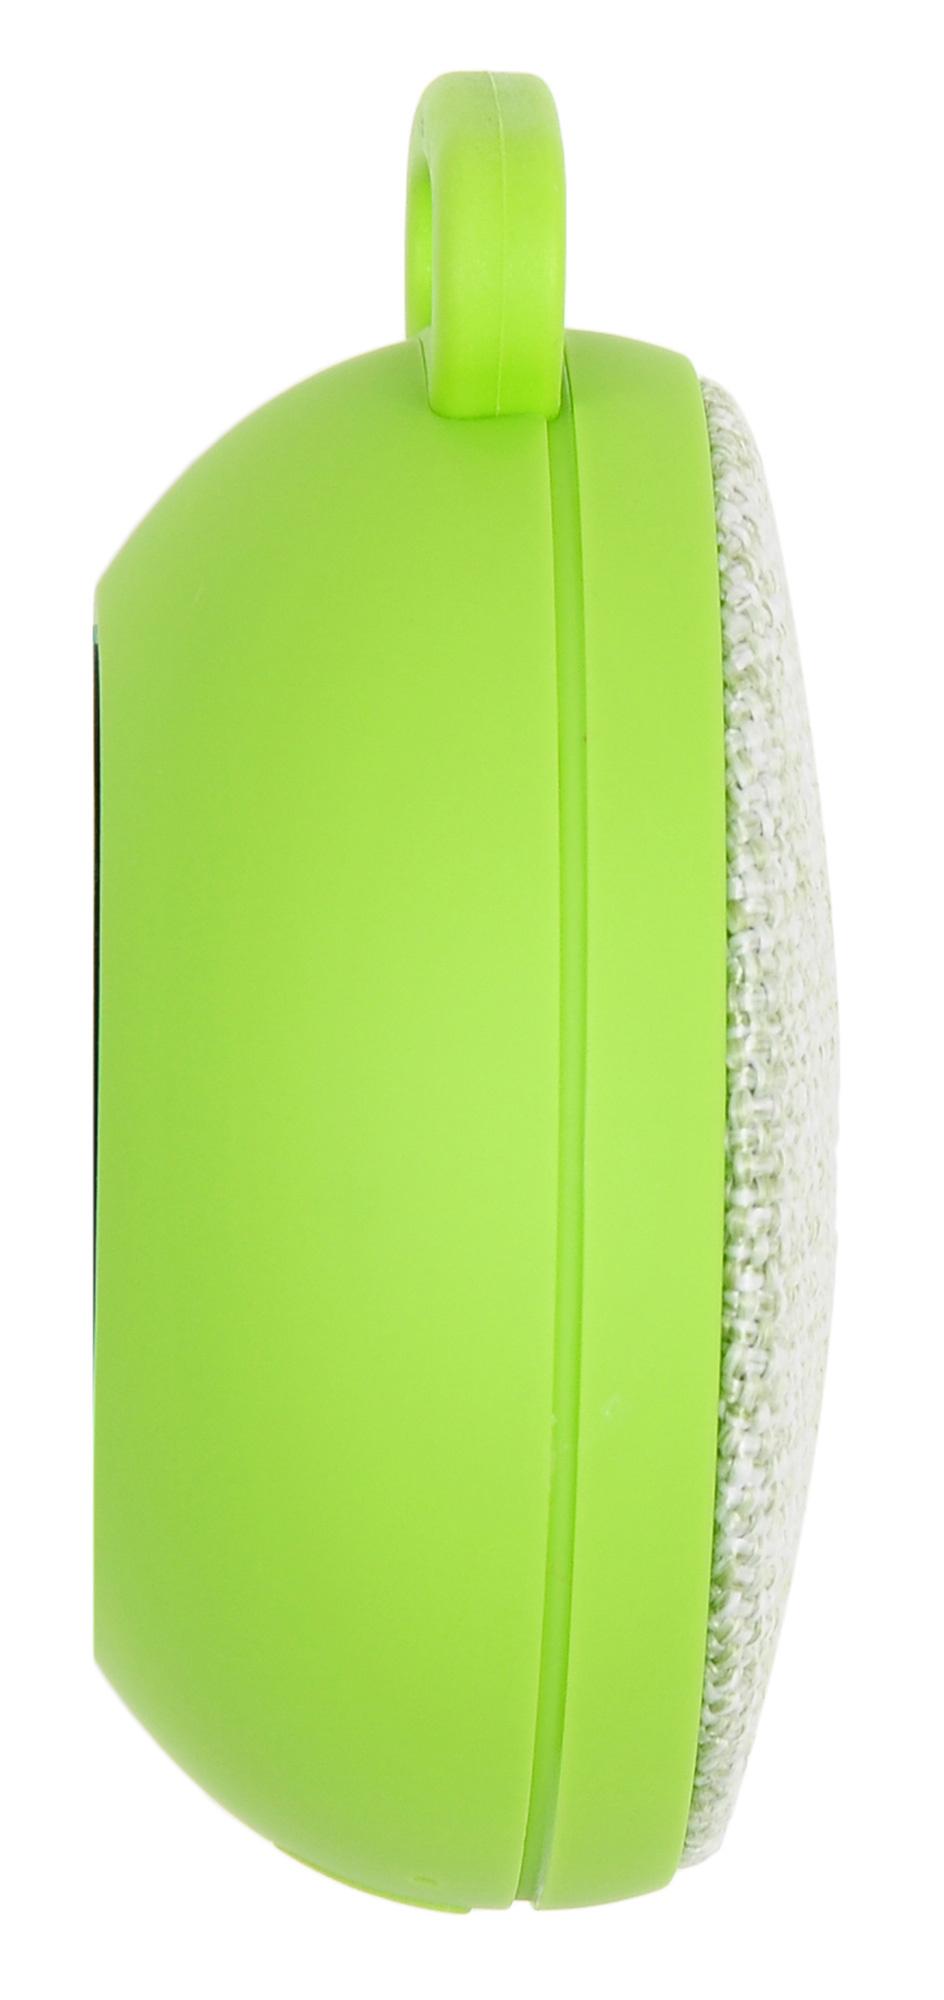 Колонка порт. Hyundai H-PAC130 светло-зеленый 3W 1.0 BT/3.5Jack/USB 10м 300mAh